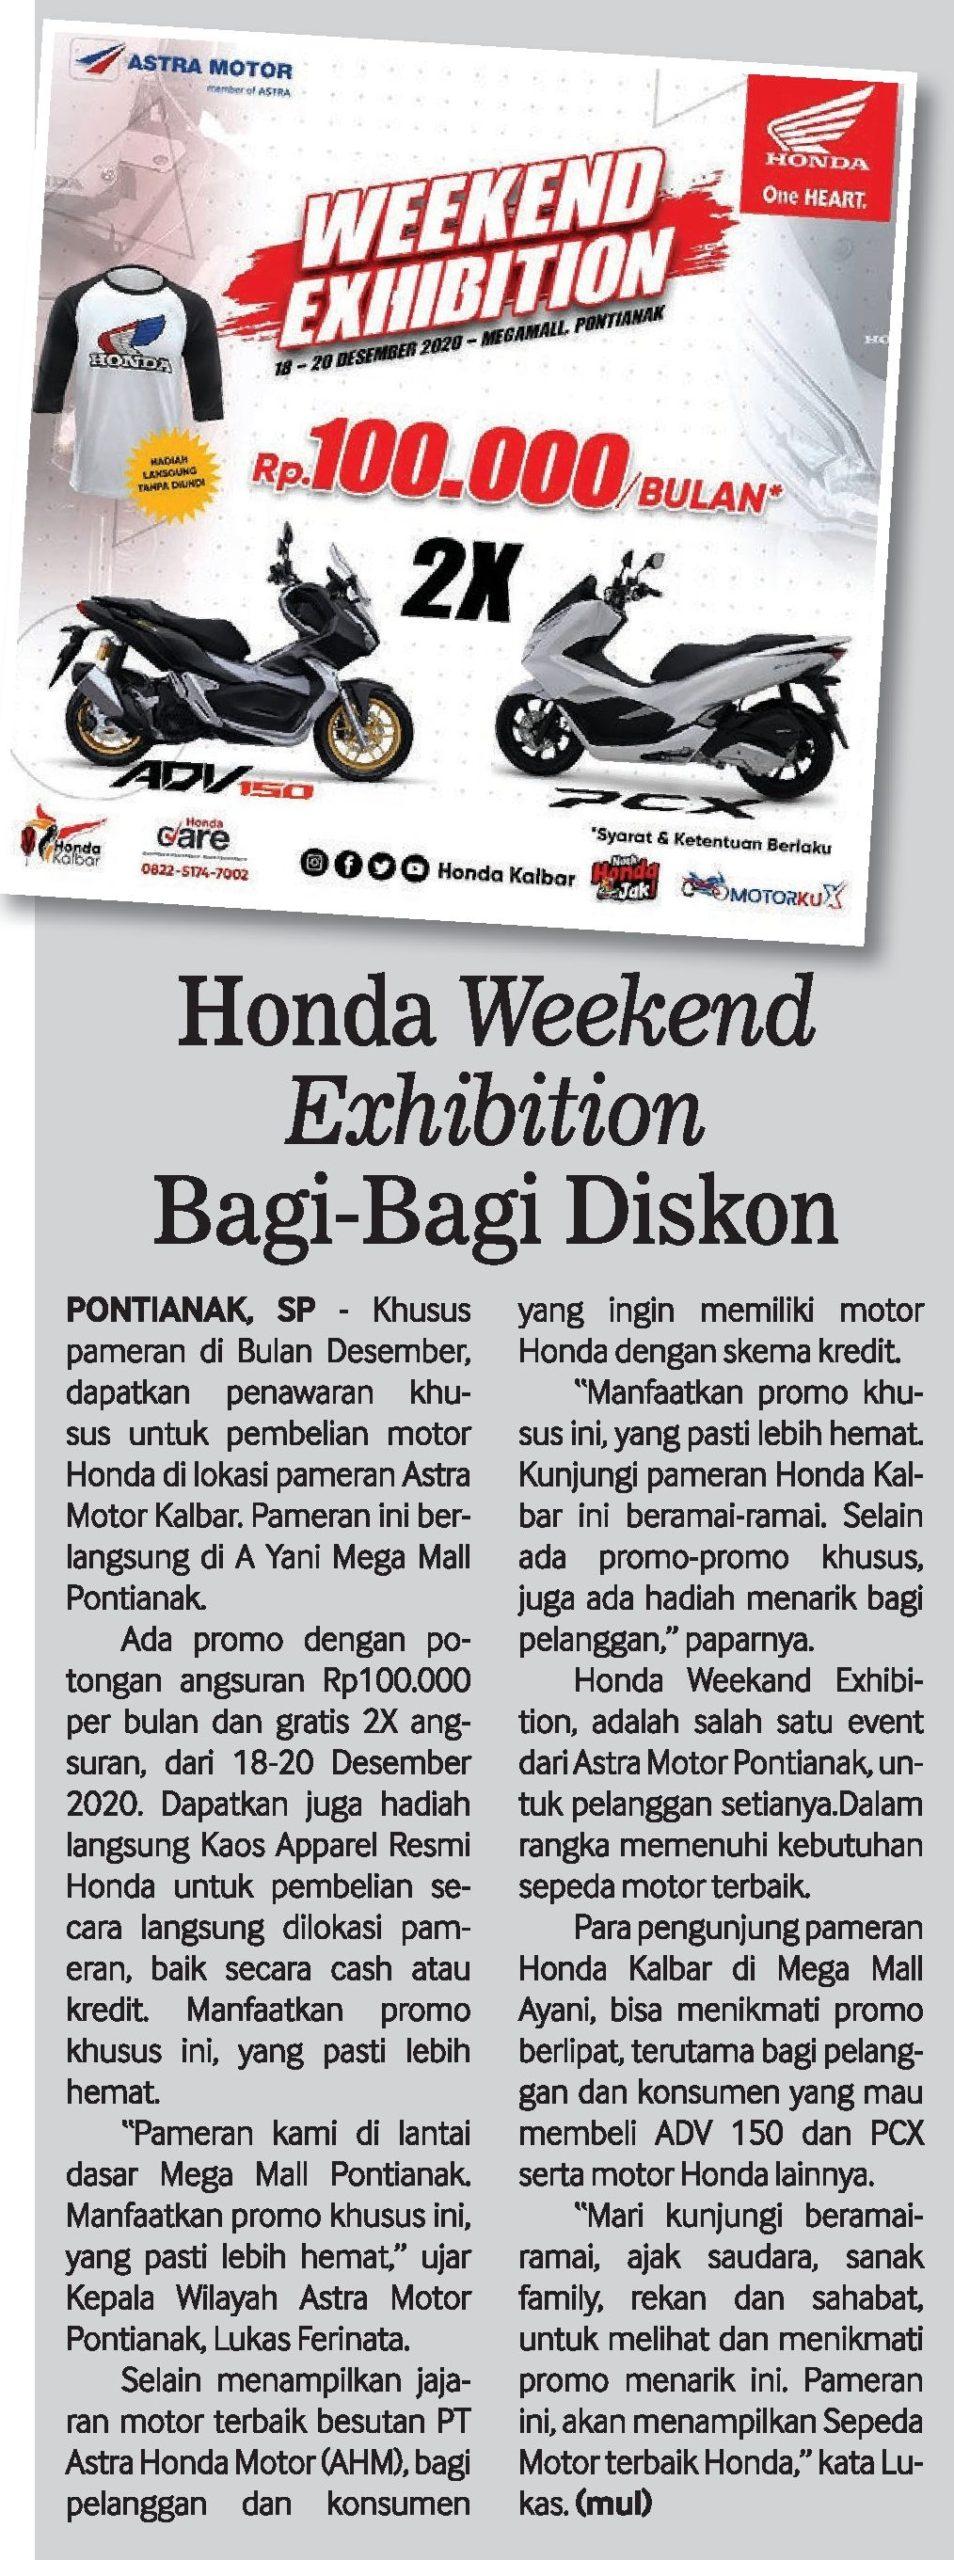 HONDA WEEKEND EXHIBITION BAGI BAGI DISKON